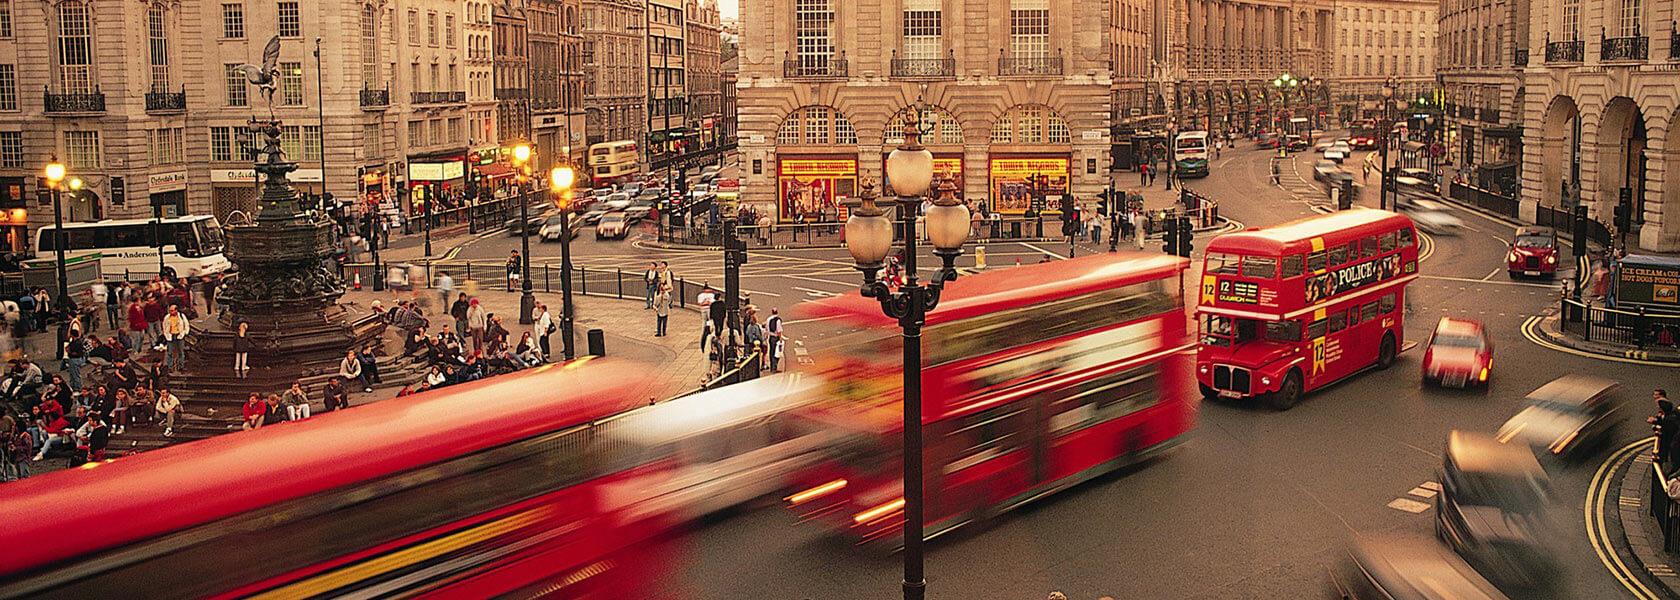 London-City